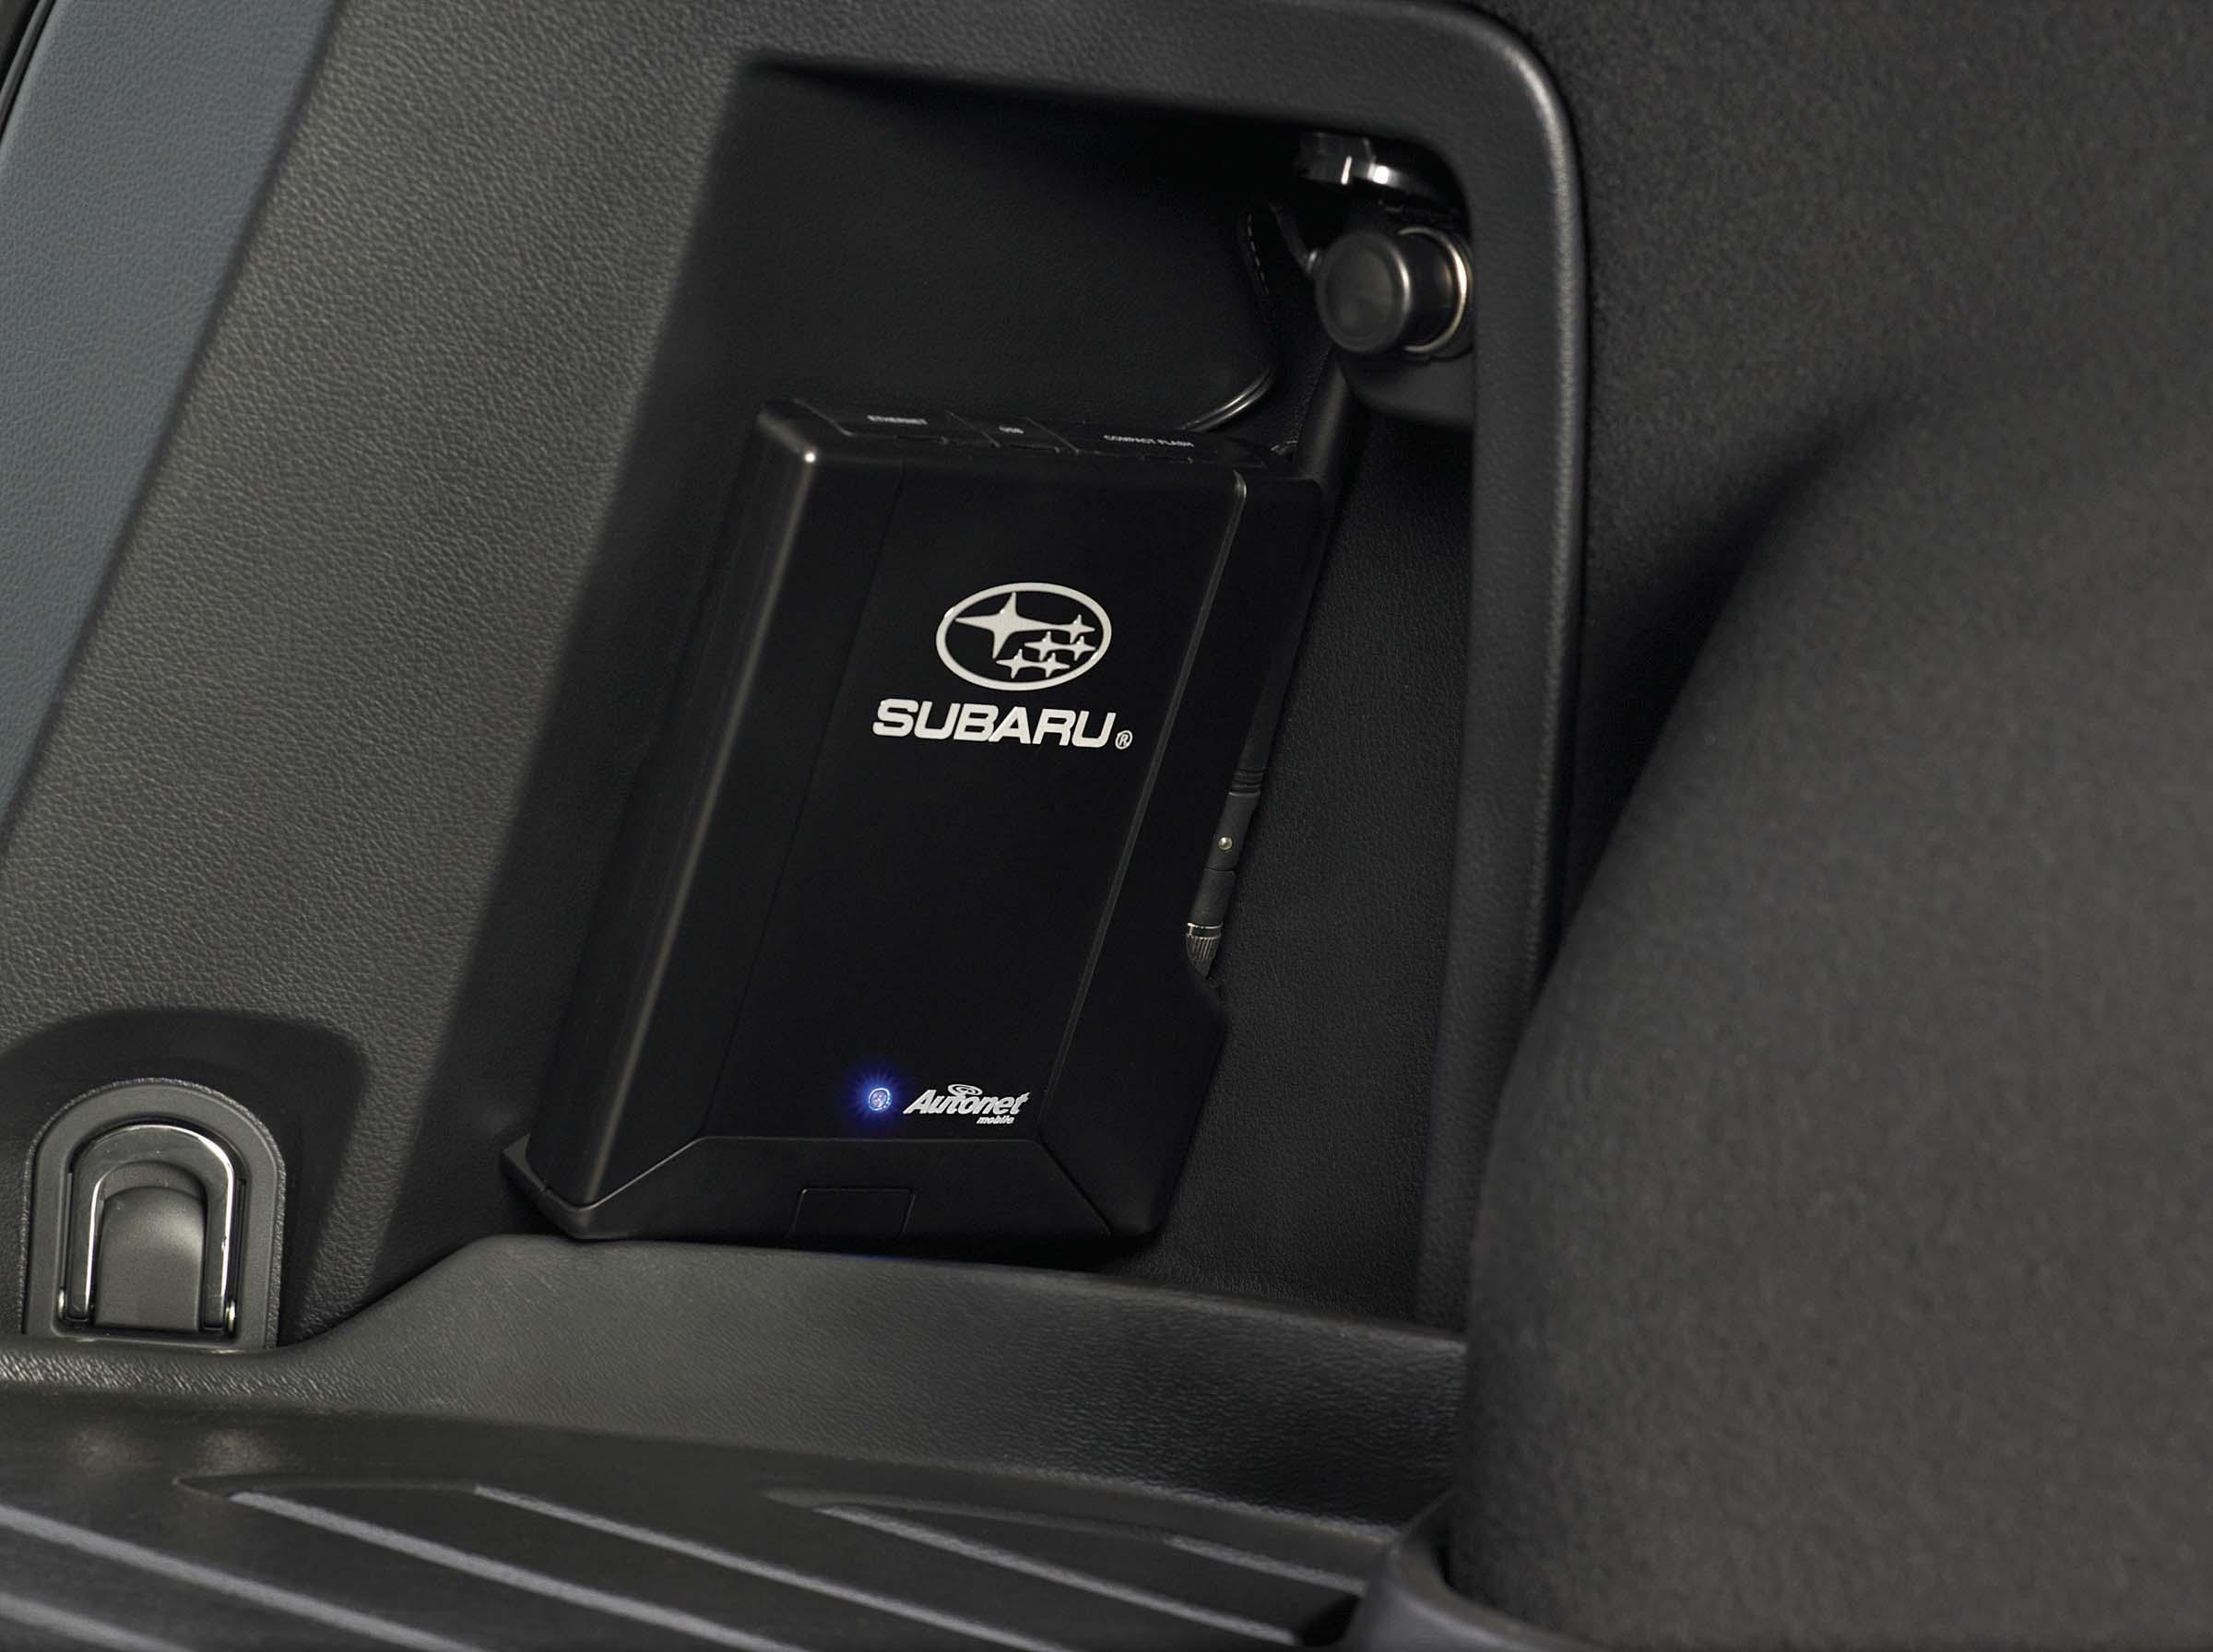 Shop Genuine 2013 Subaru Outback Accessories From Rafferty